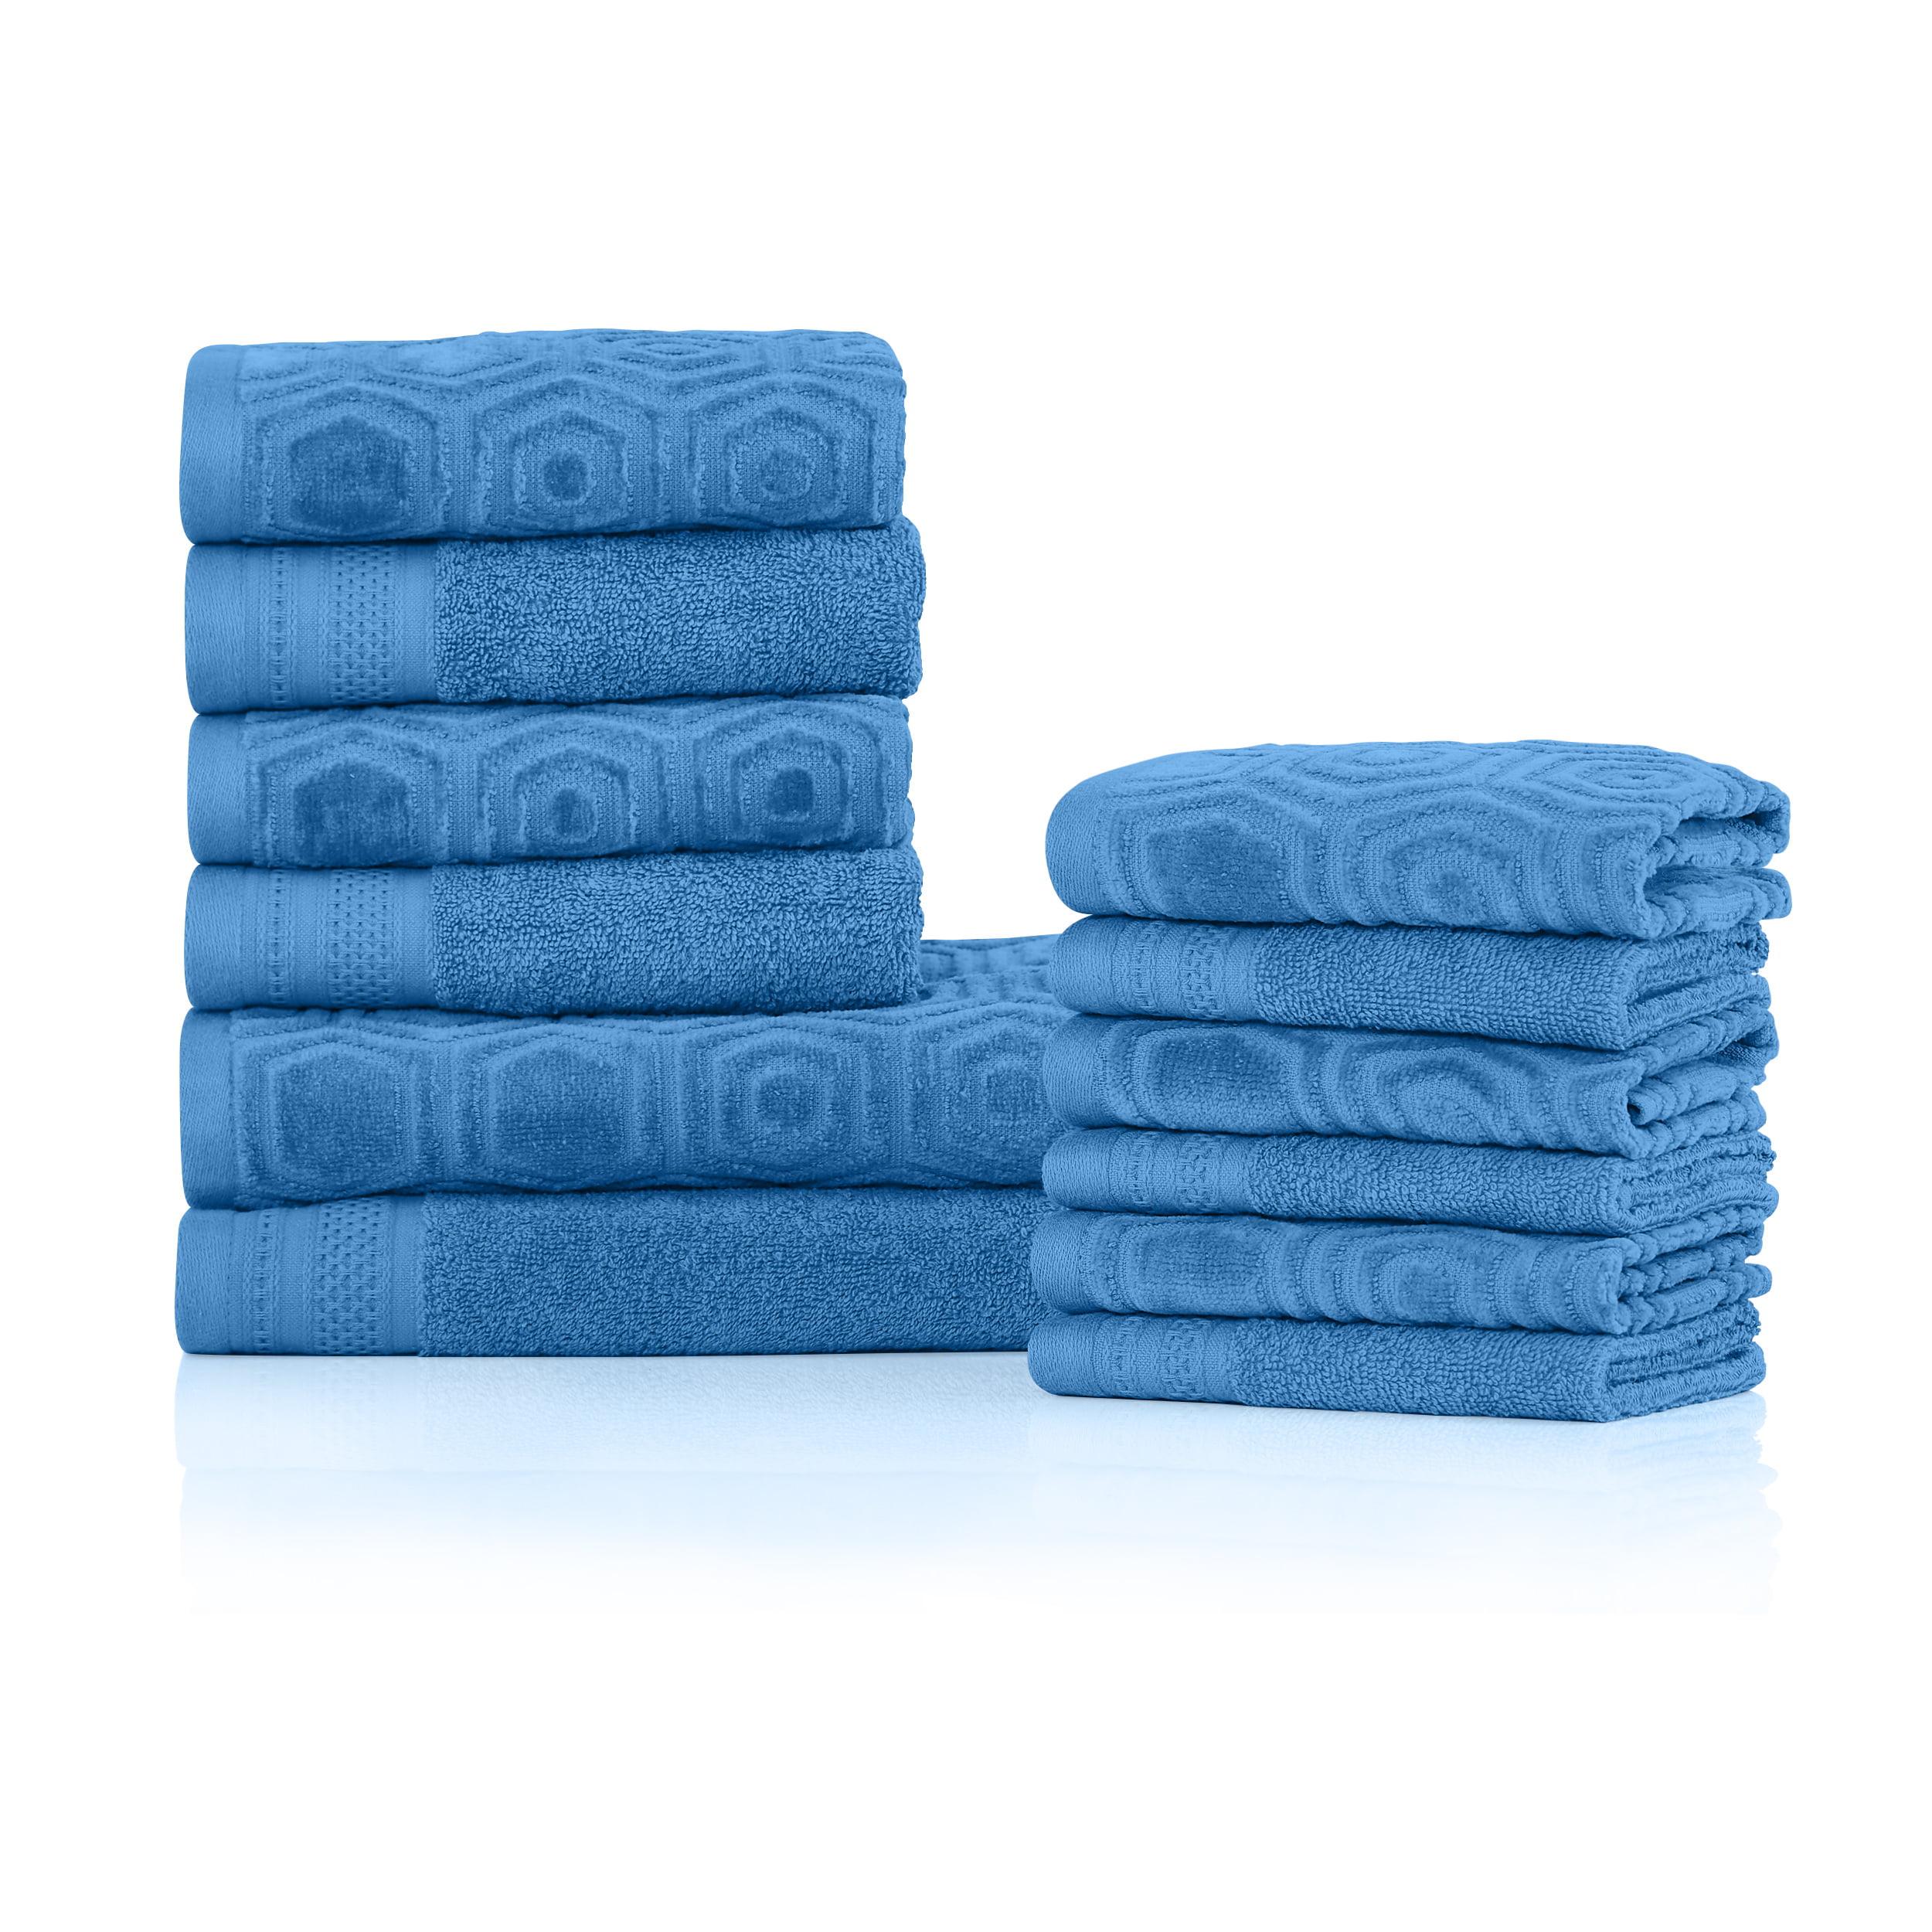 Superior 100% Cotton Honeycomb 12-piece Towel Set